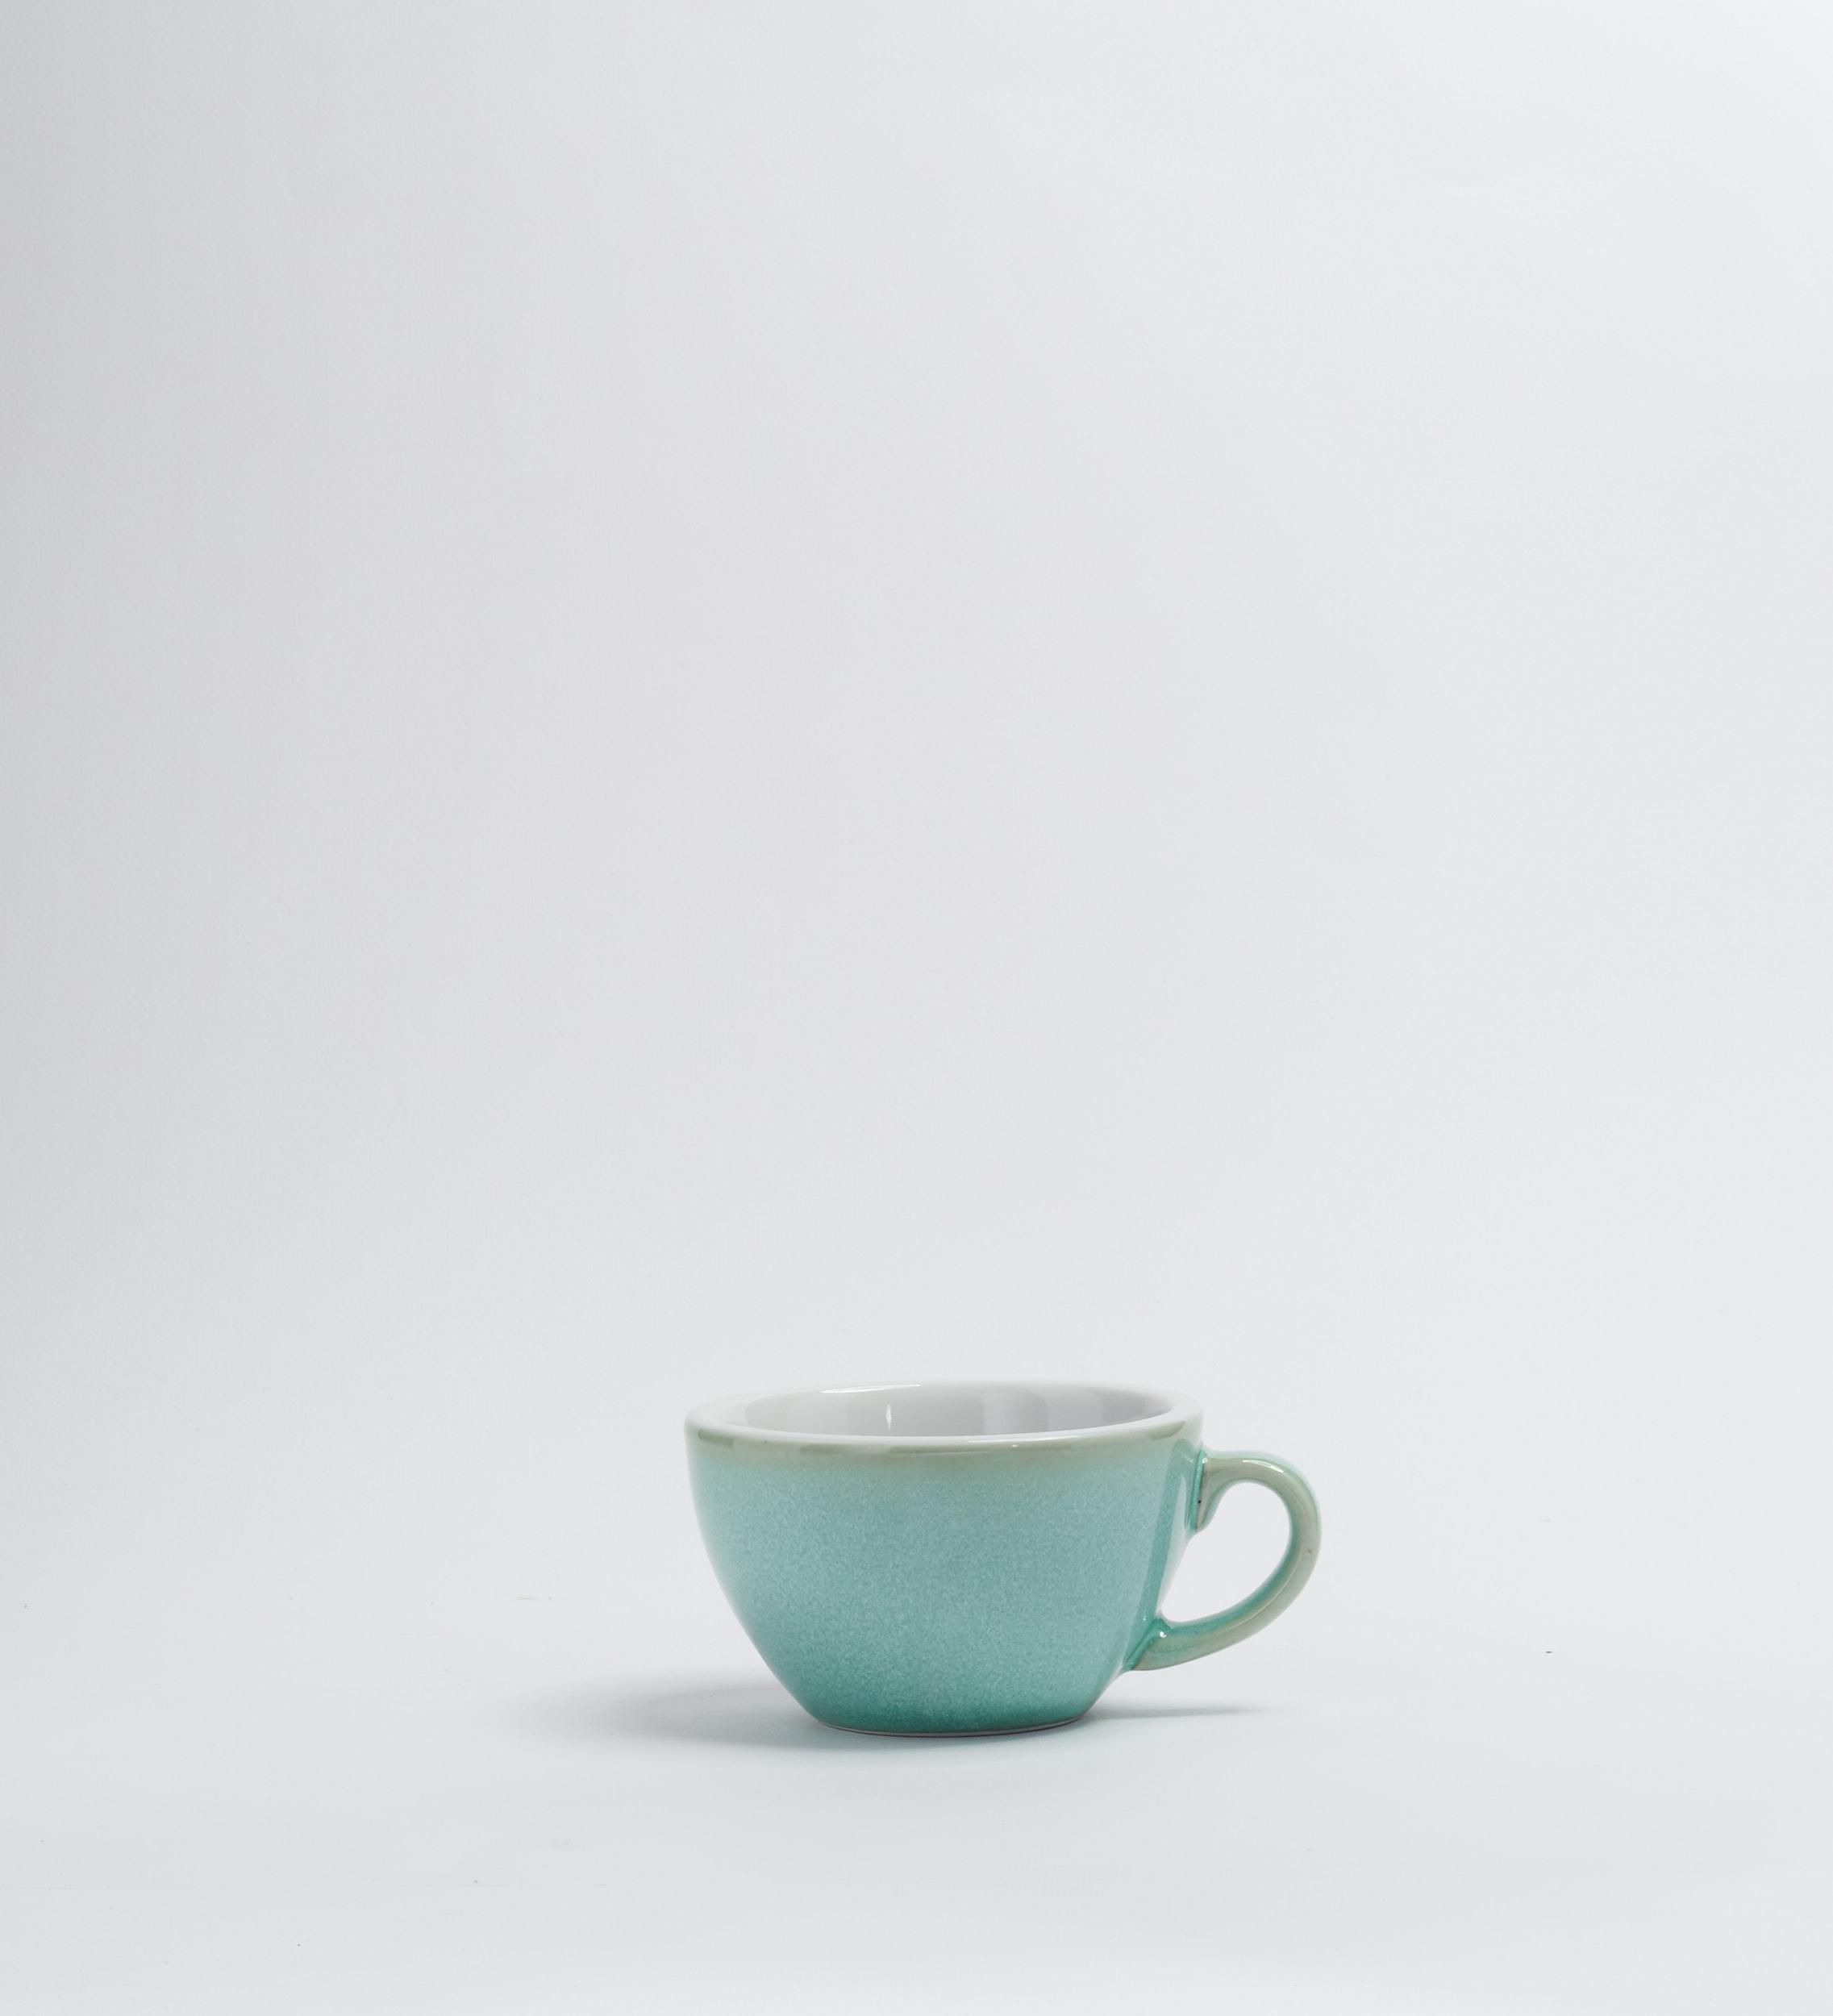 Egg Tassen Cappuccino, 200ml-prev-2